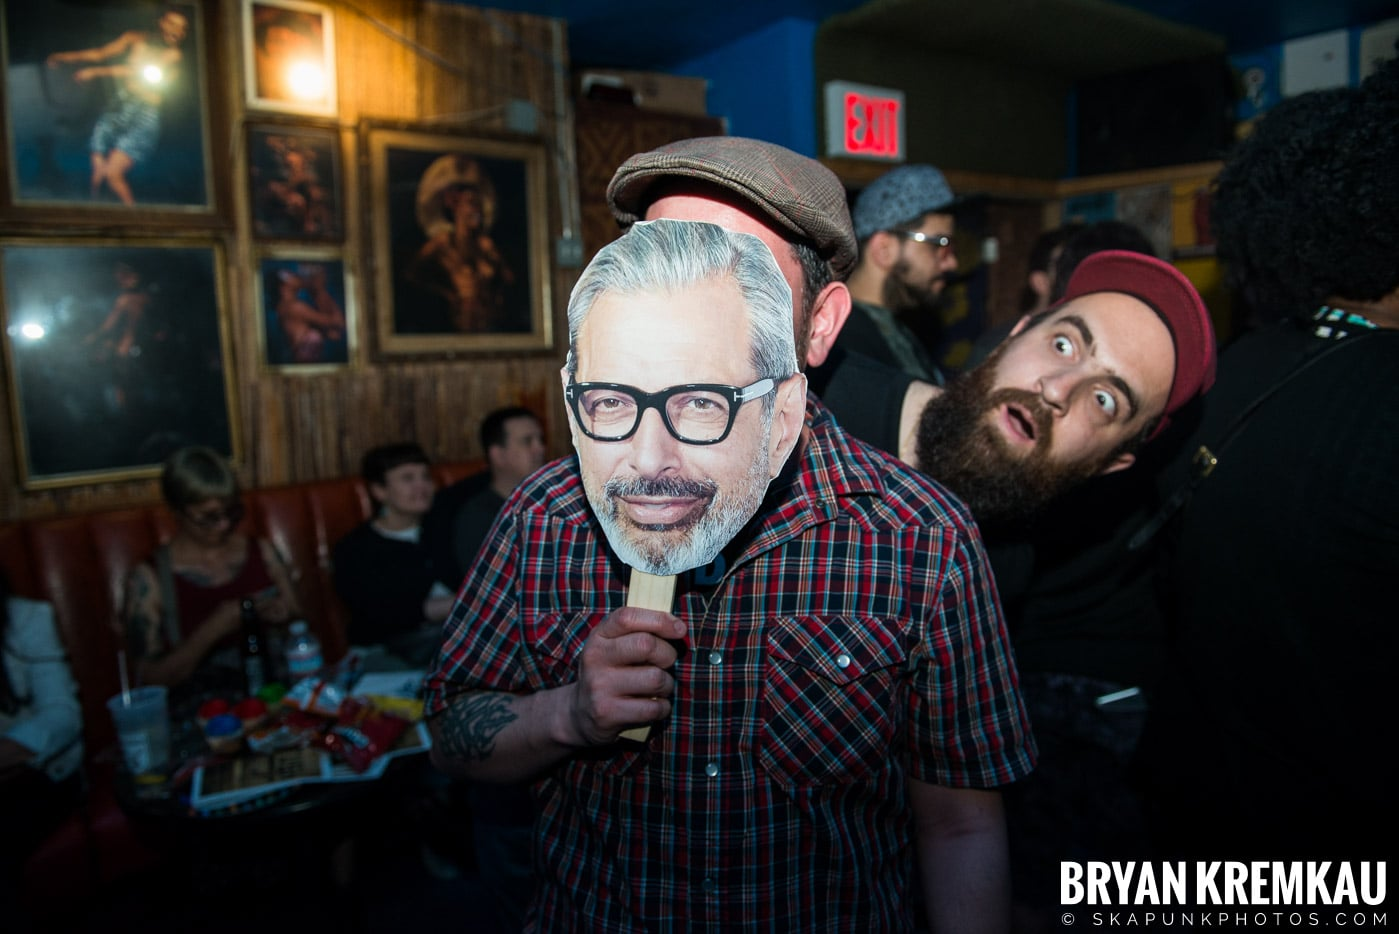 ReadJunk.com 20th Anniversary Party @ Otto's Shrunken Head, NYC - 4.29.17 (27)